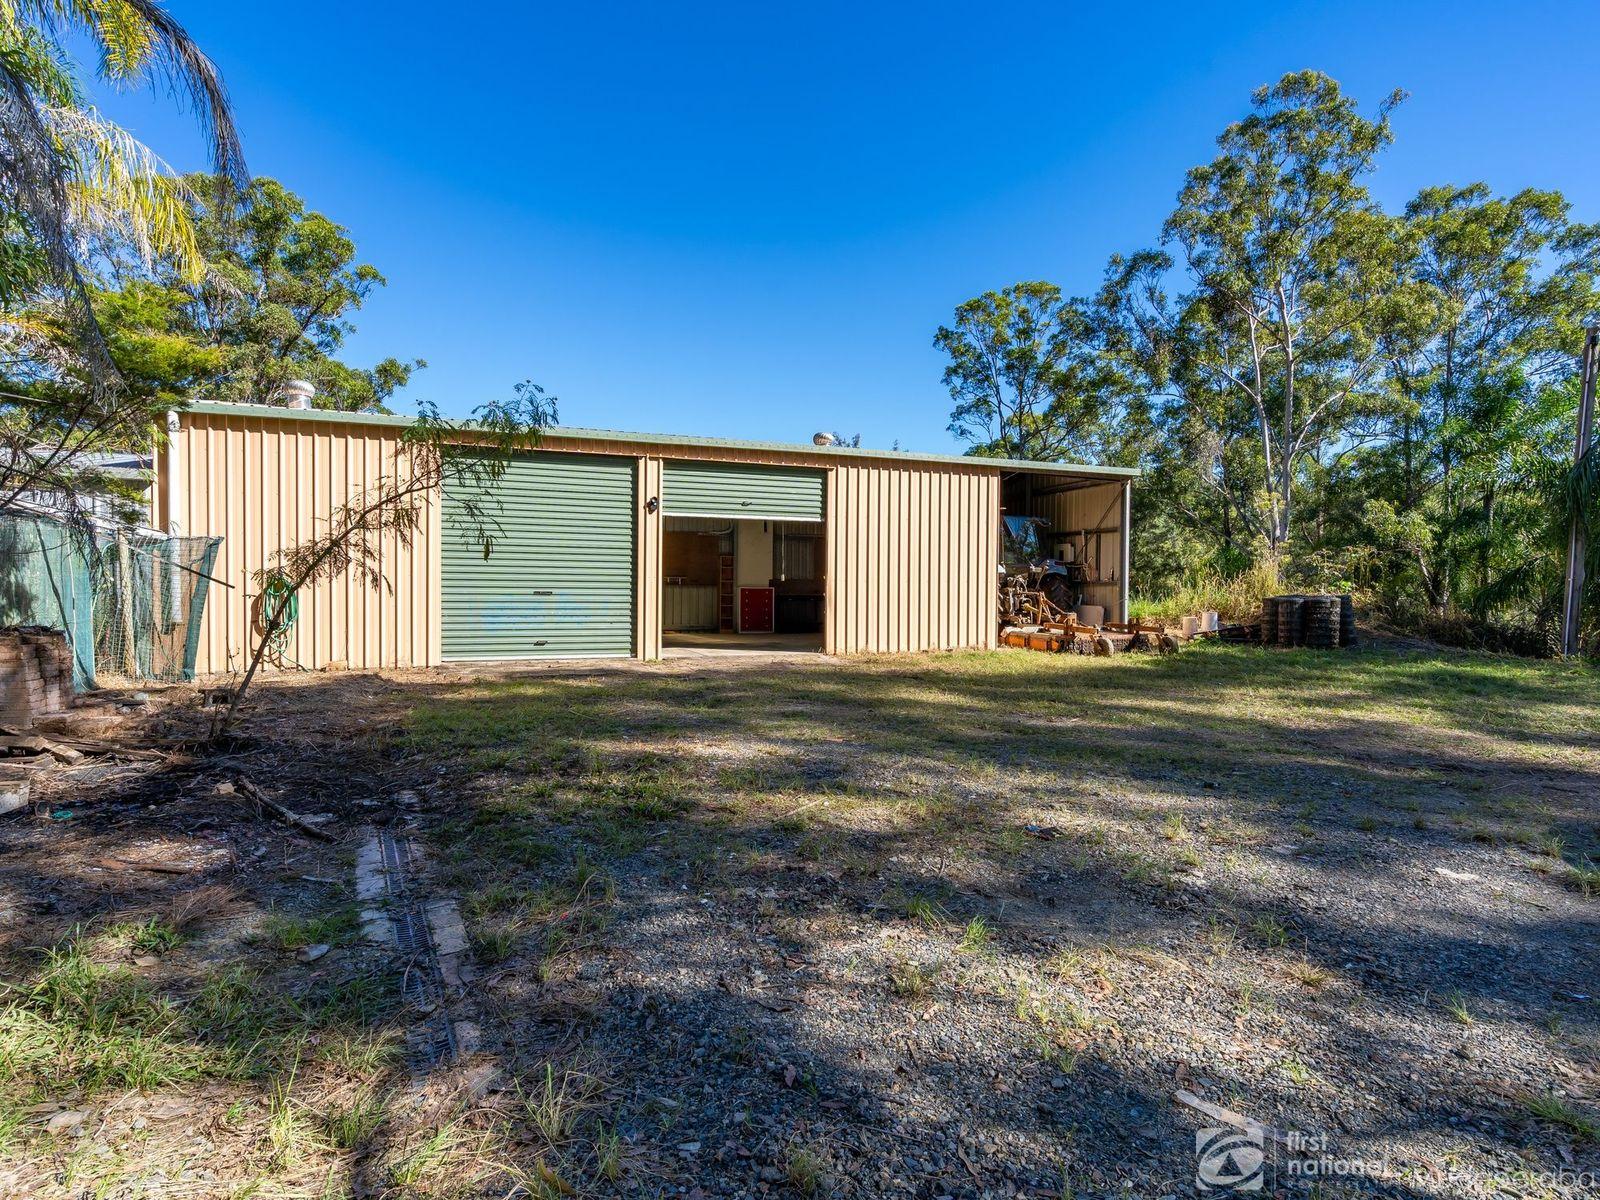 250 Austinville Road, Austinville, QLD 4213